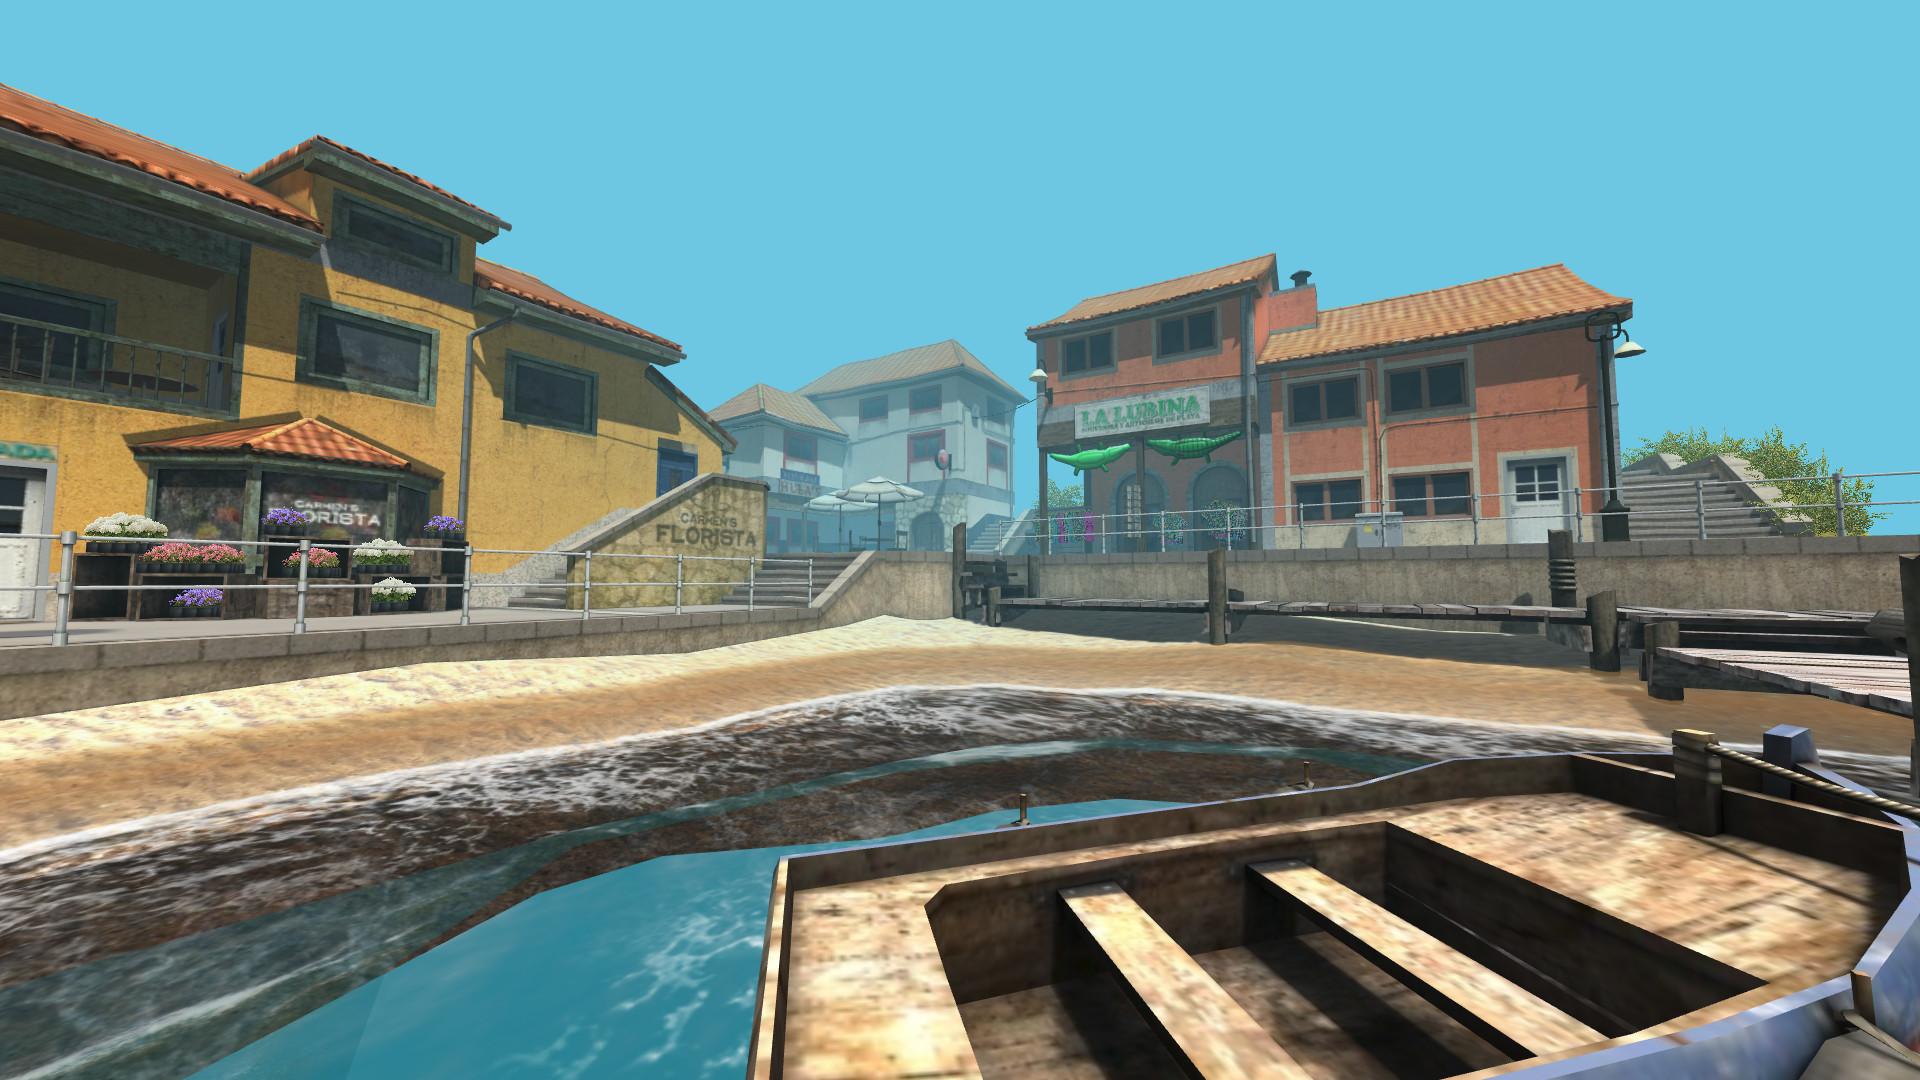 IMBRSea docks